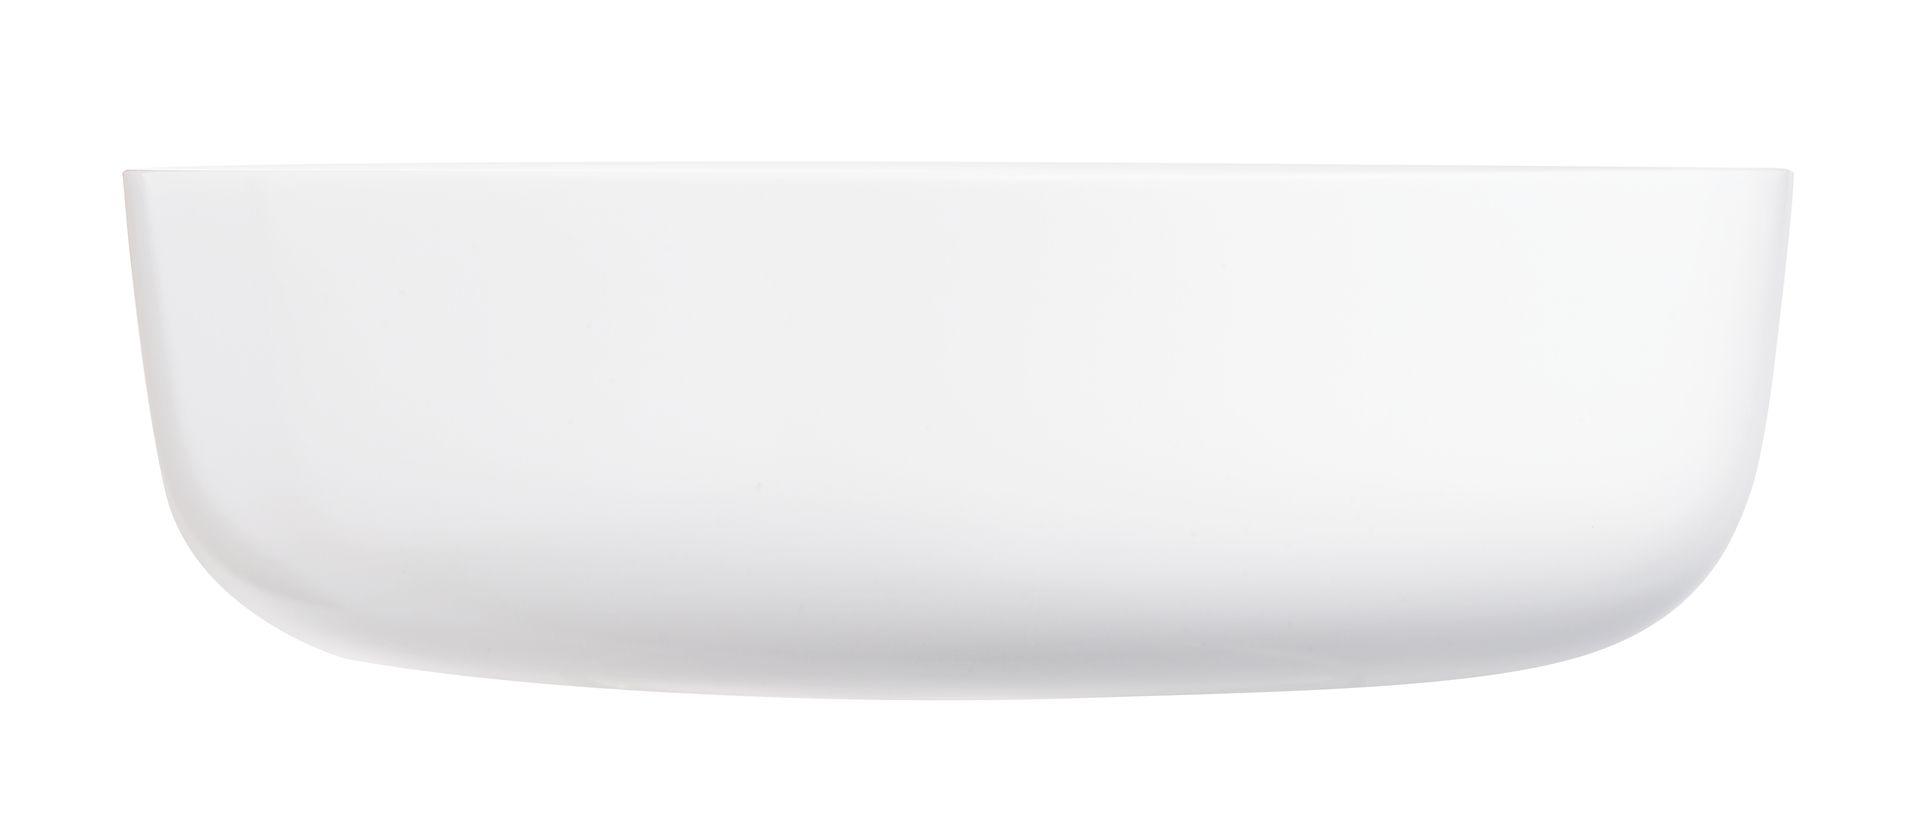 Travessa Refratária Diwali Vidro Branco 18cm 1,3l Luminarc